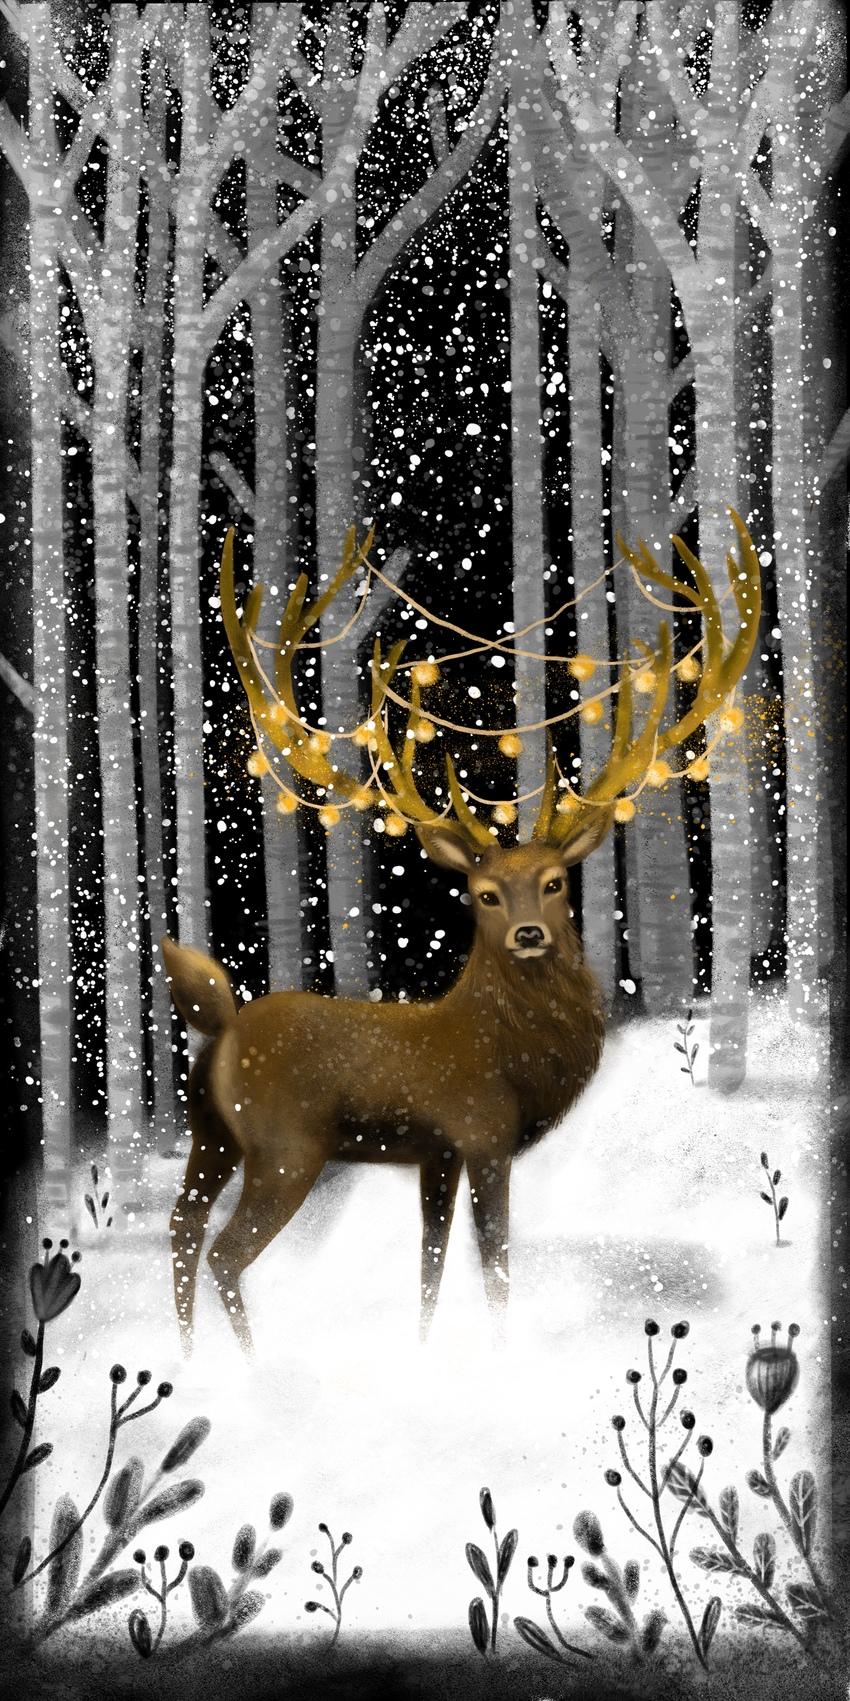 1-Happynewyear2018-deer-lights-snow.jpg